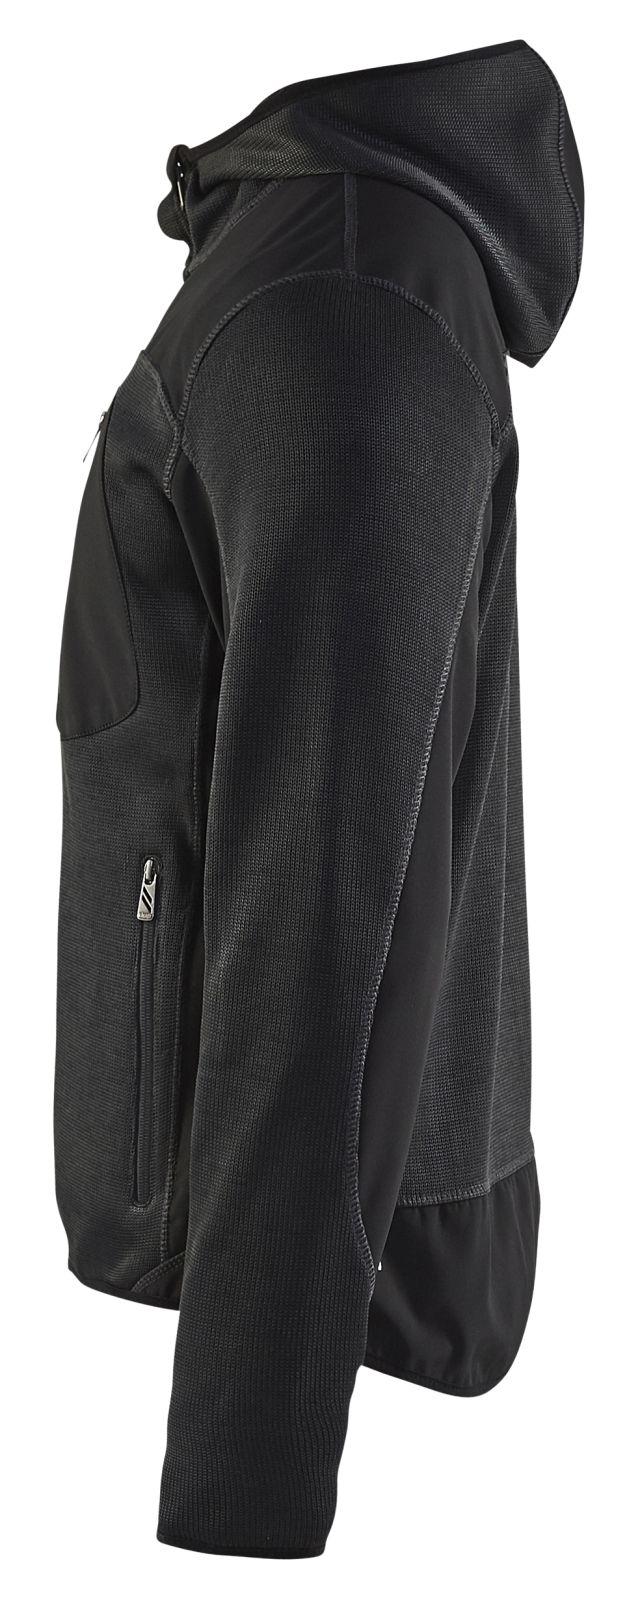 Blaklader Gebreide vesten 49302117 donkergrijs-zwart(9799)